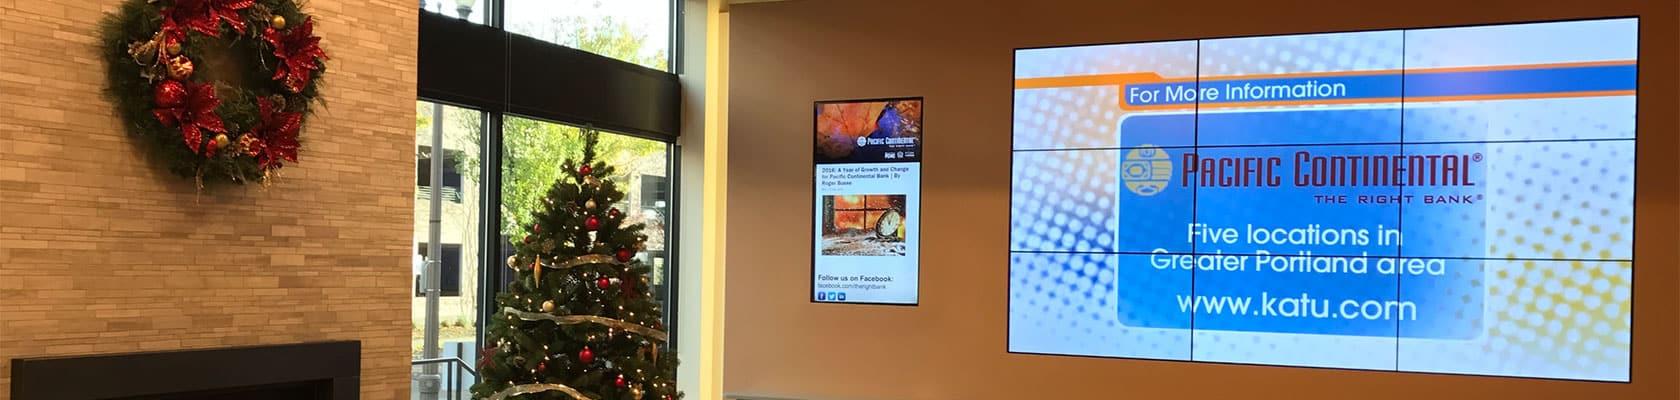 Lobby Screen Installation